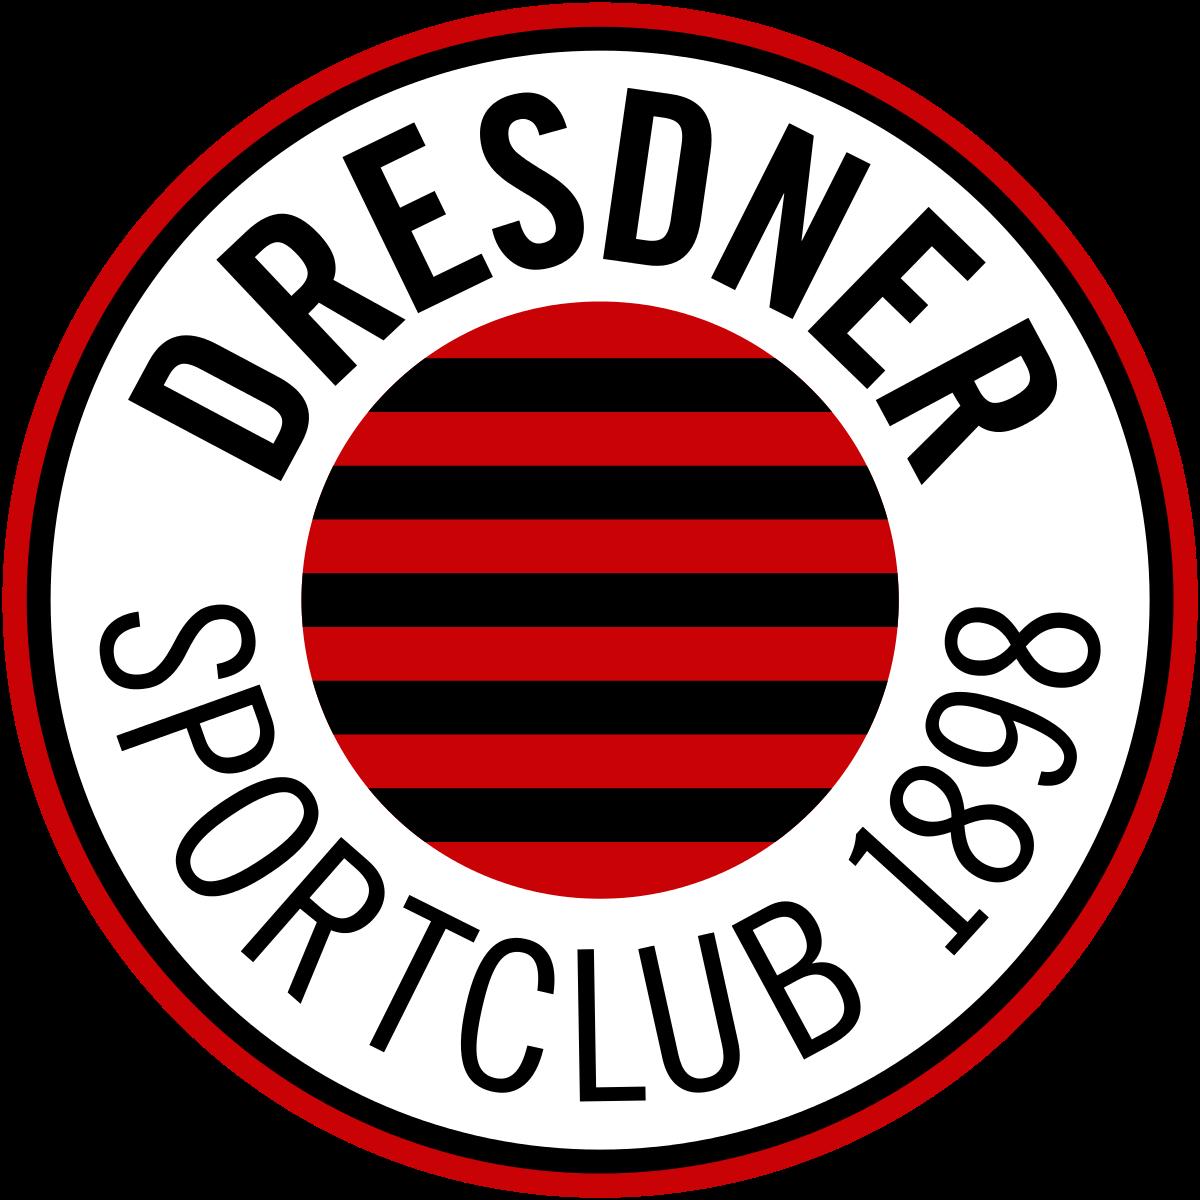 Dresdner-sc-1898.svg